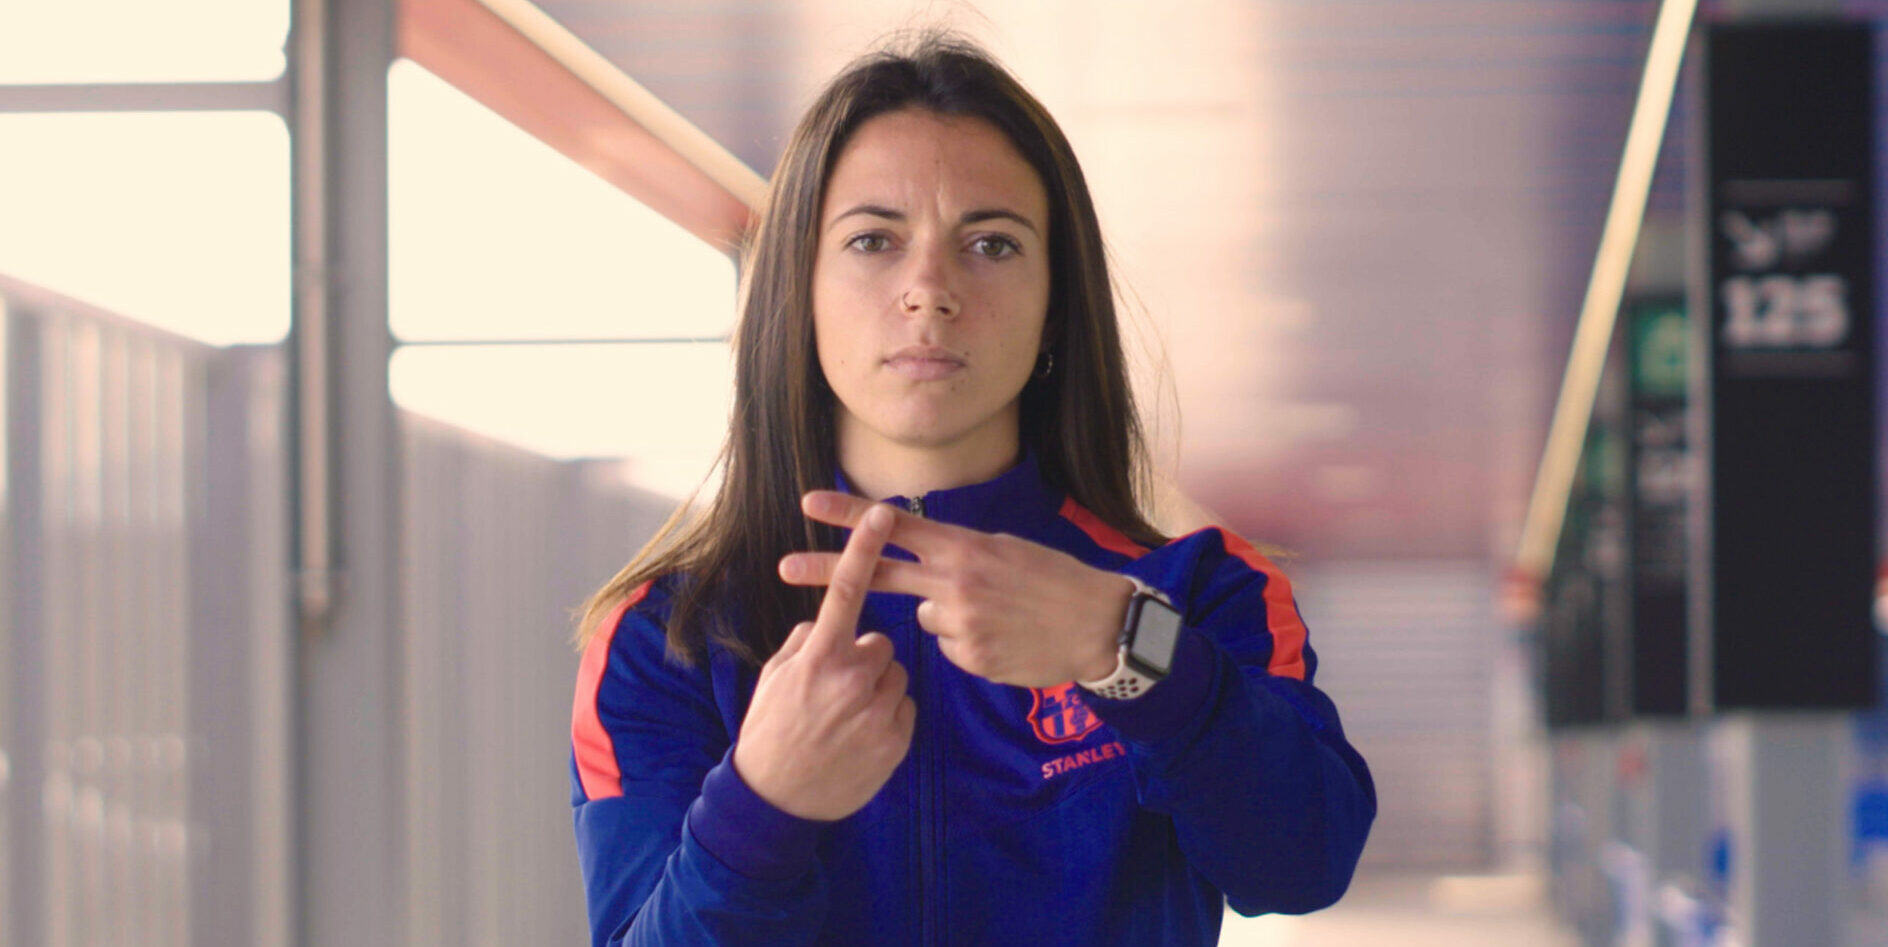 Aitana Bonmatí, a la campanya We are all different | FC Barcelona